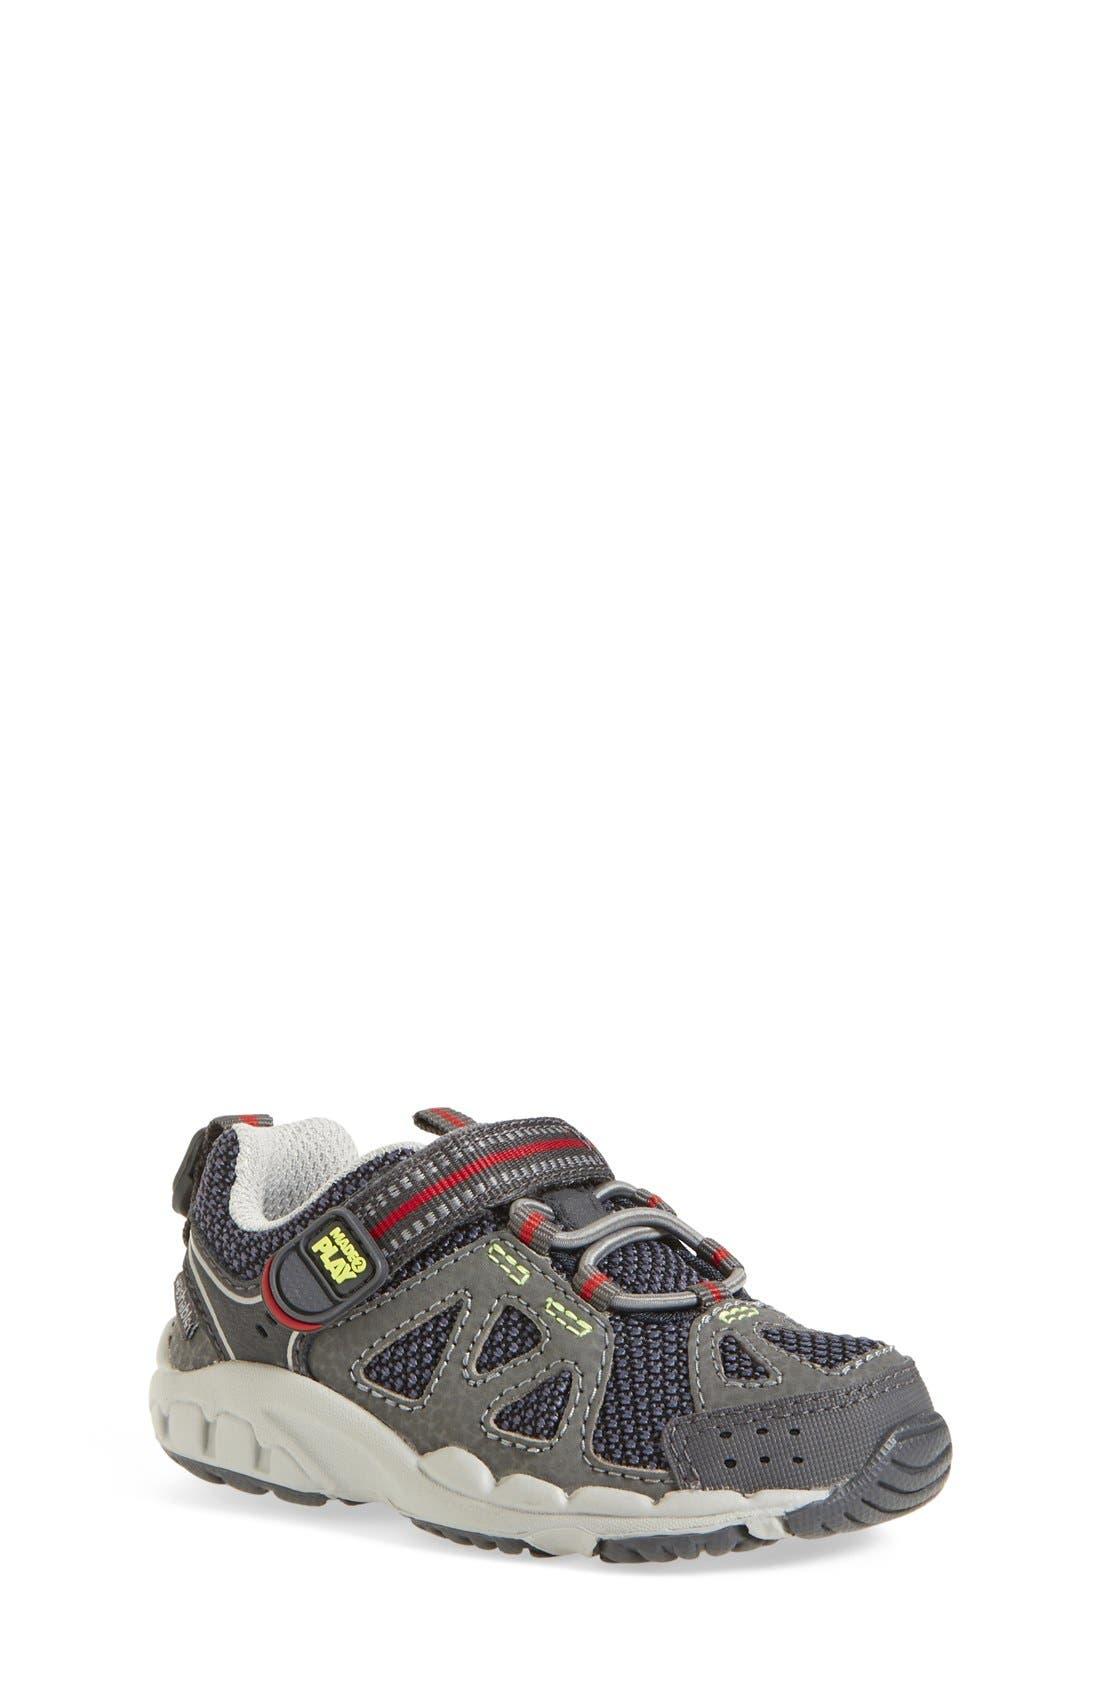 Alternate Image 1 Selected - Stride Rite 'Made 2 Play® Ian' Sneaker (Baby, Walker & Toddler)